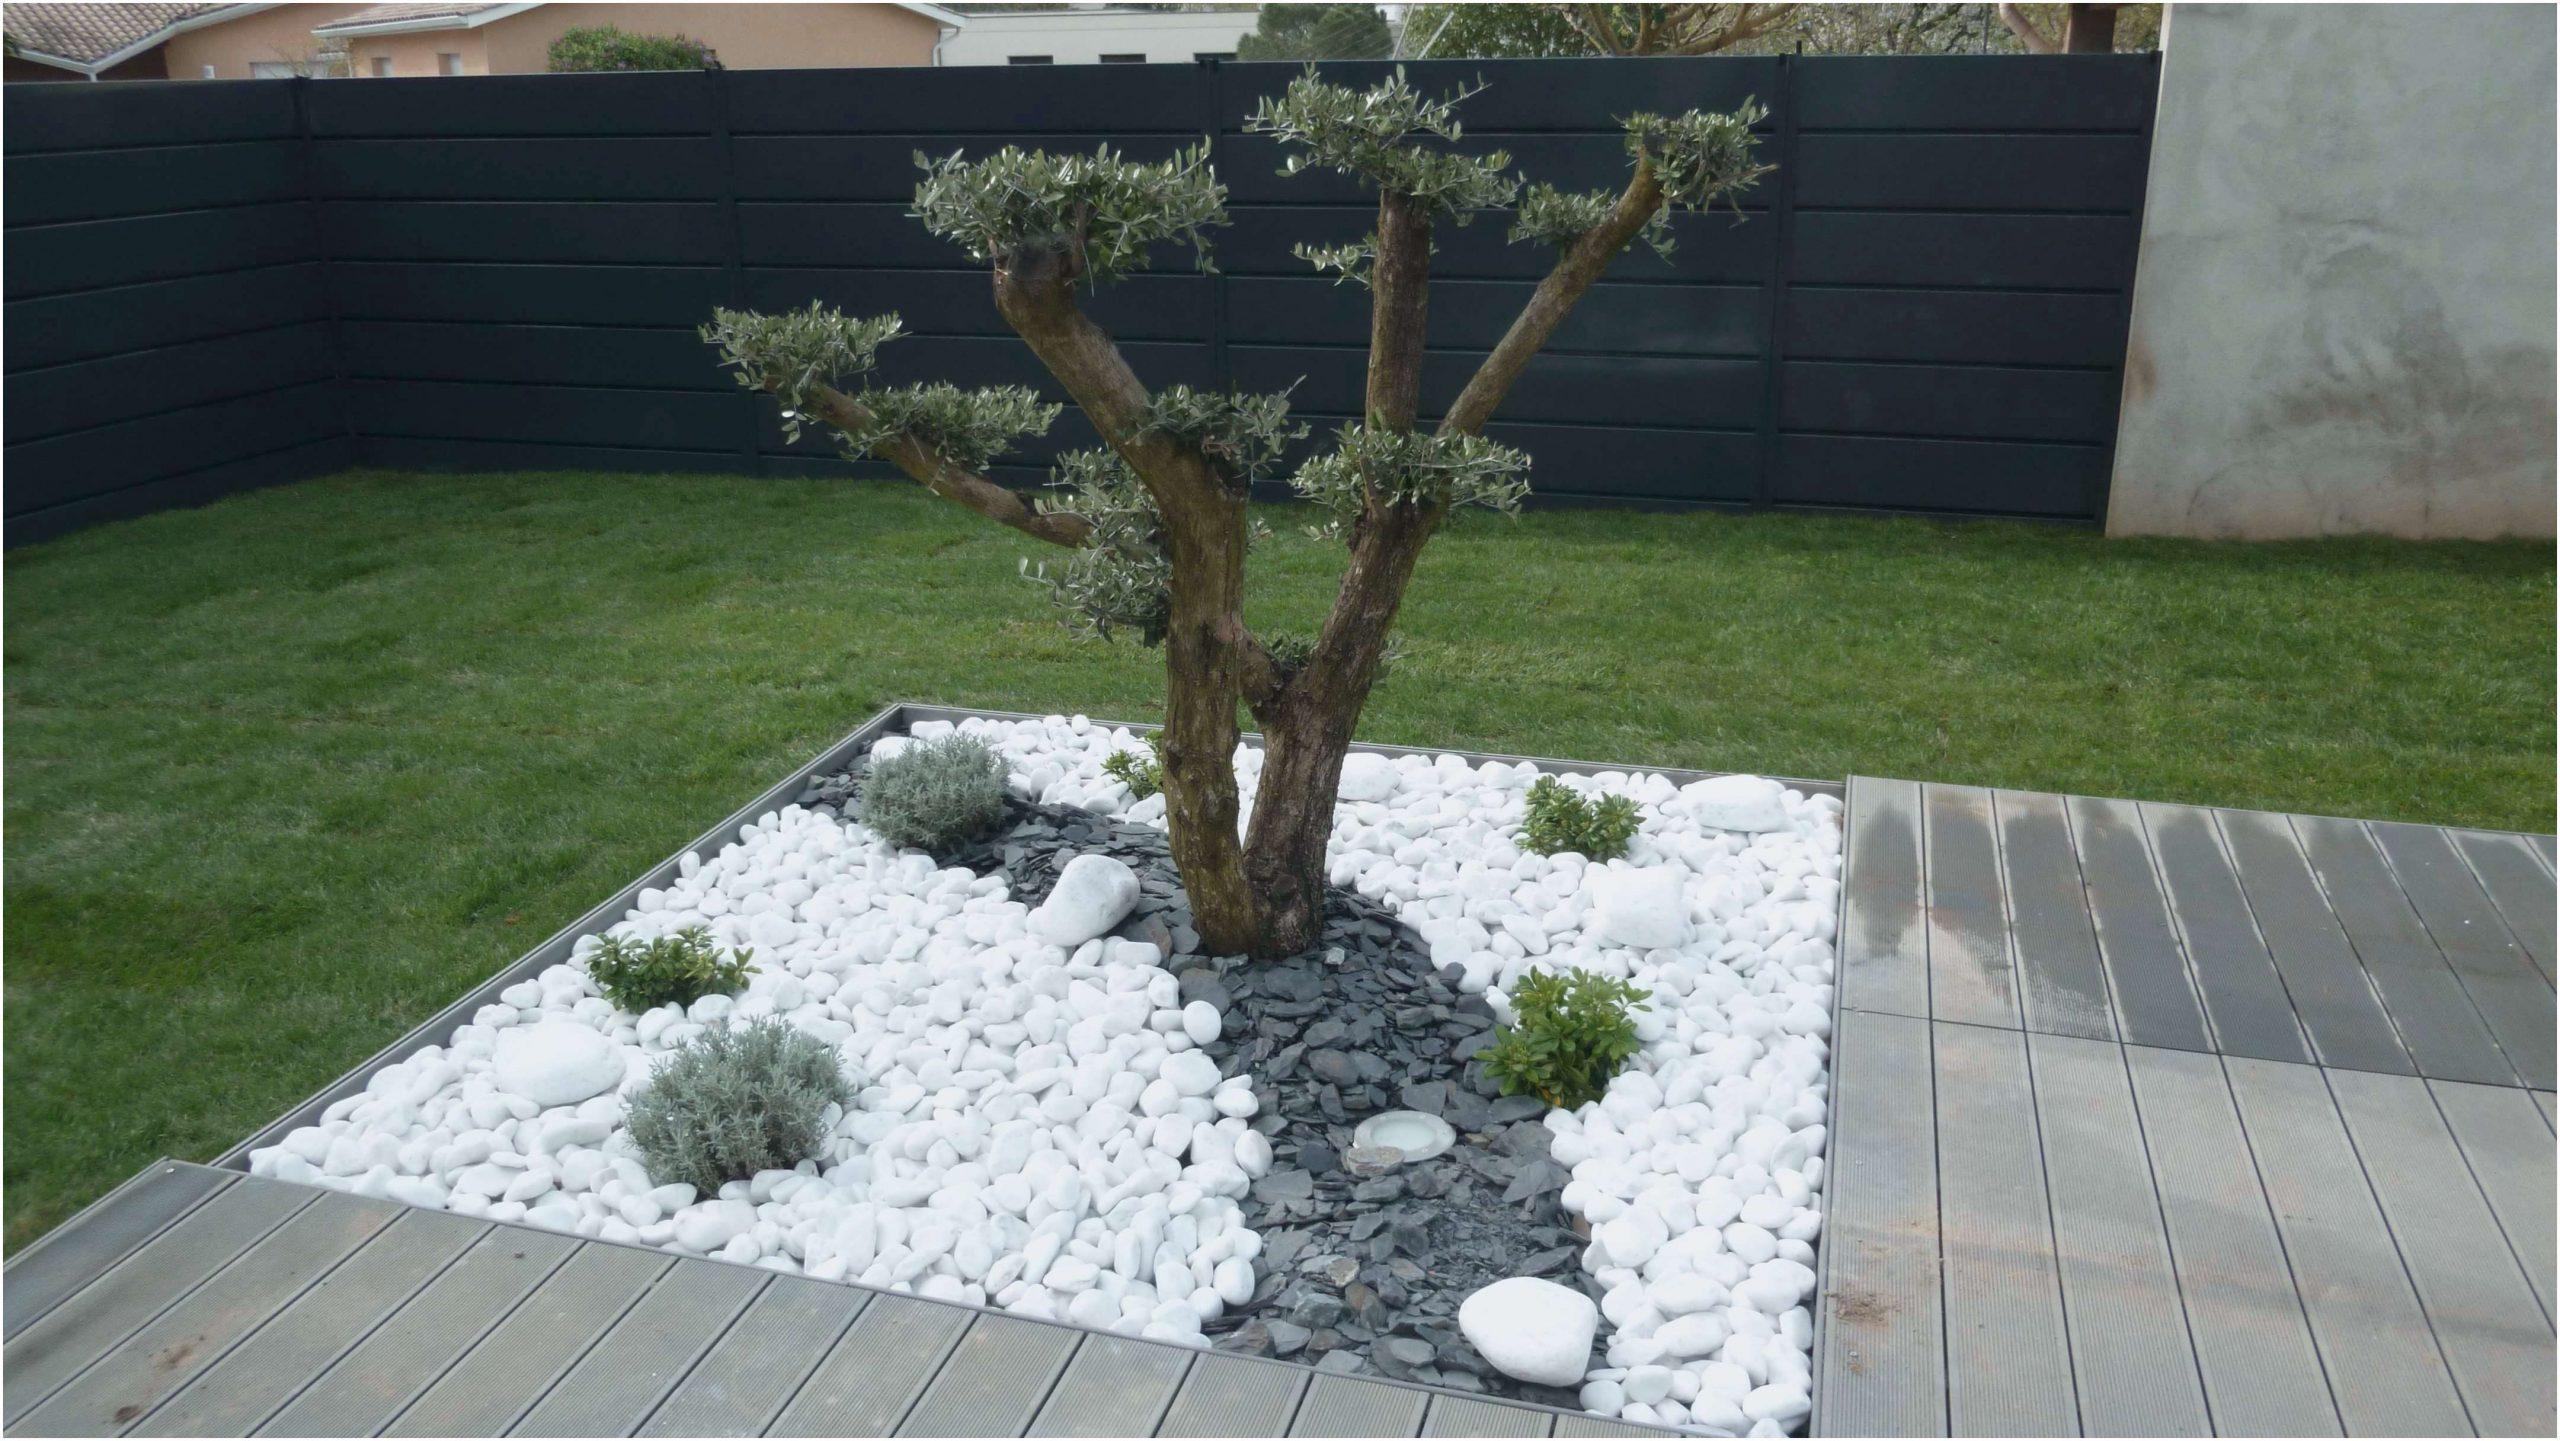 Idee Deco Jardin Avec Gravillon | Idee Deco Jardin ... encequiconcerne Galet Blanc Jardin